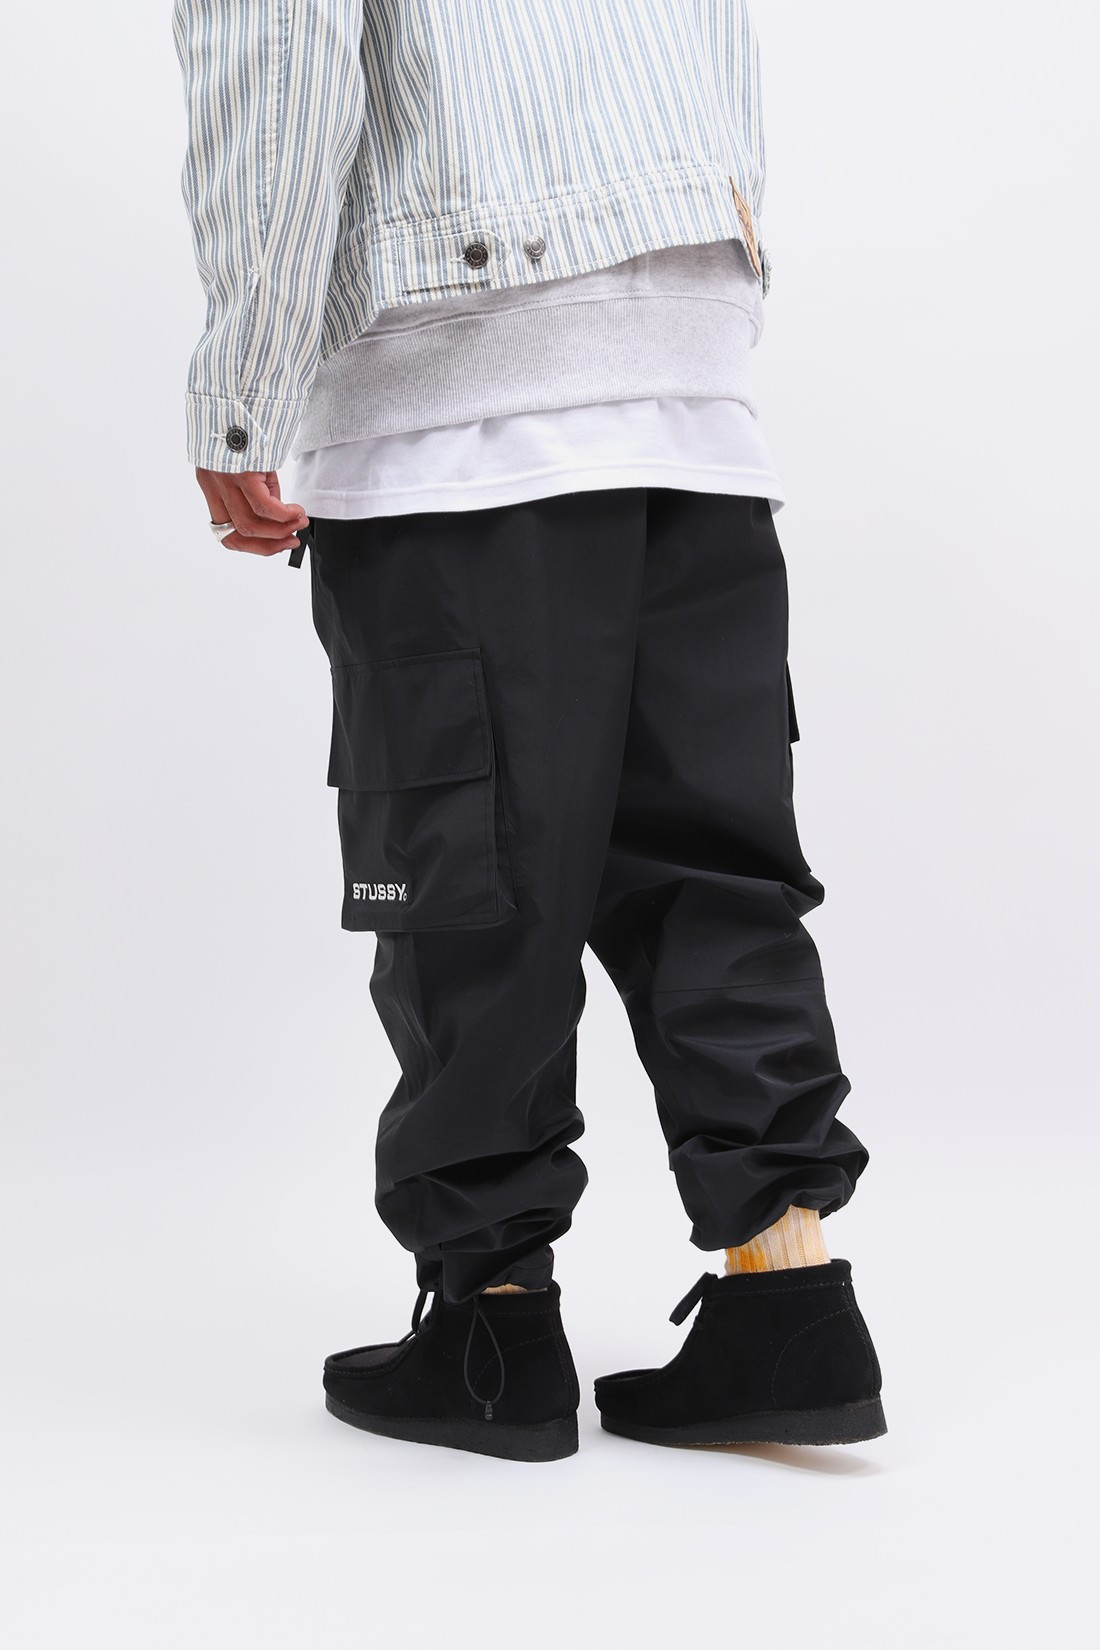 STUSSY / Apex pant Black